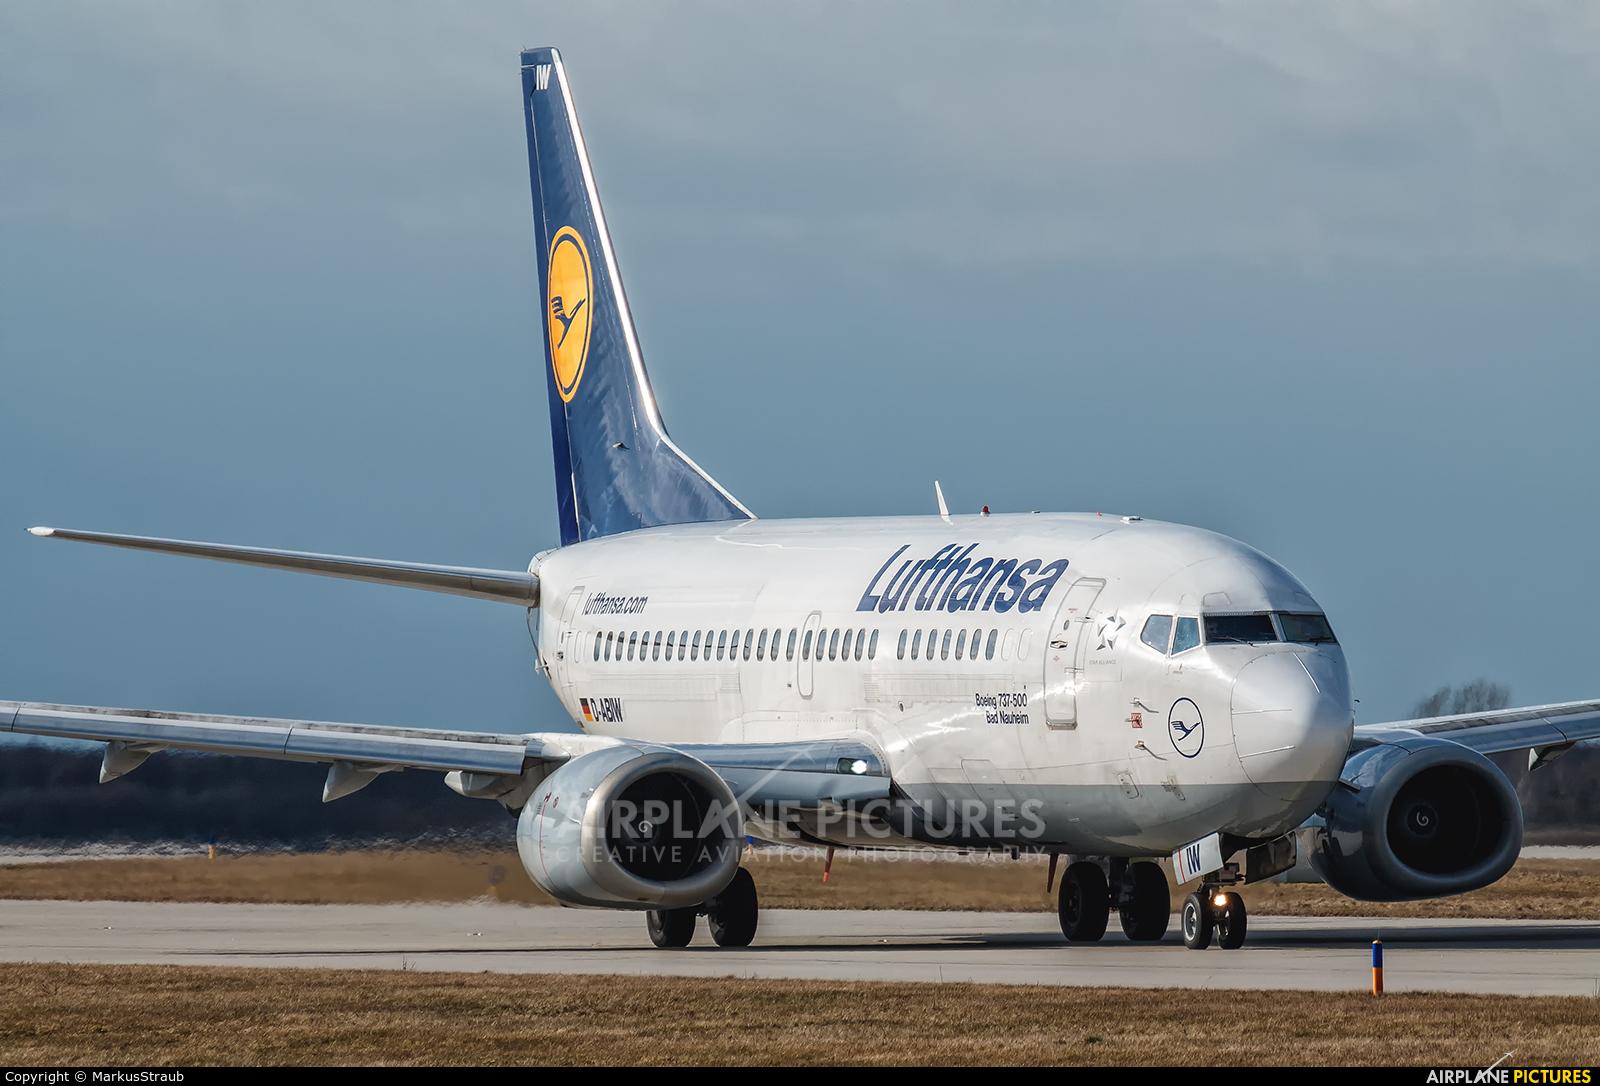 Lufthansa D-ABIW aircraft at Leipzig - Halle